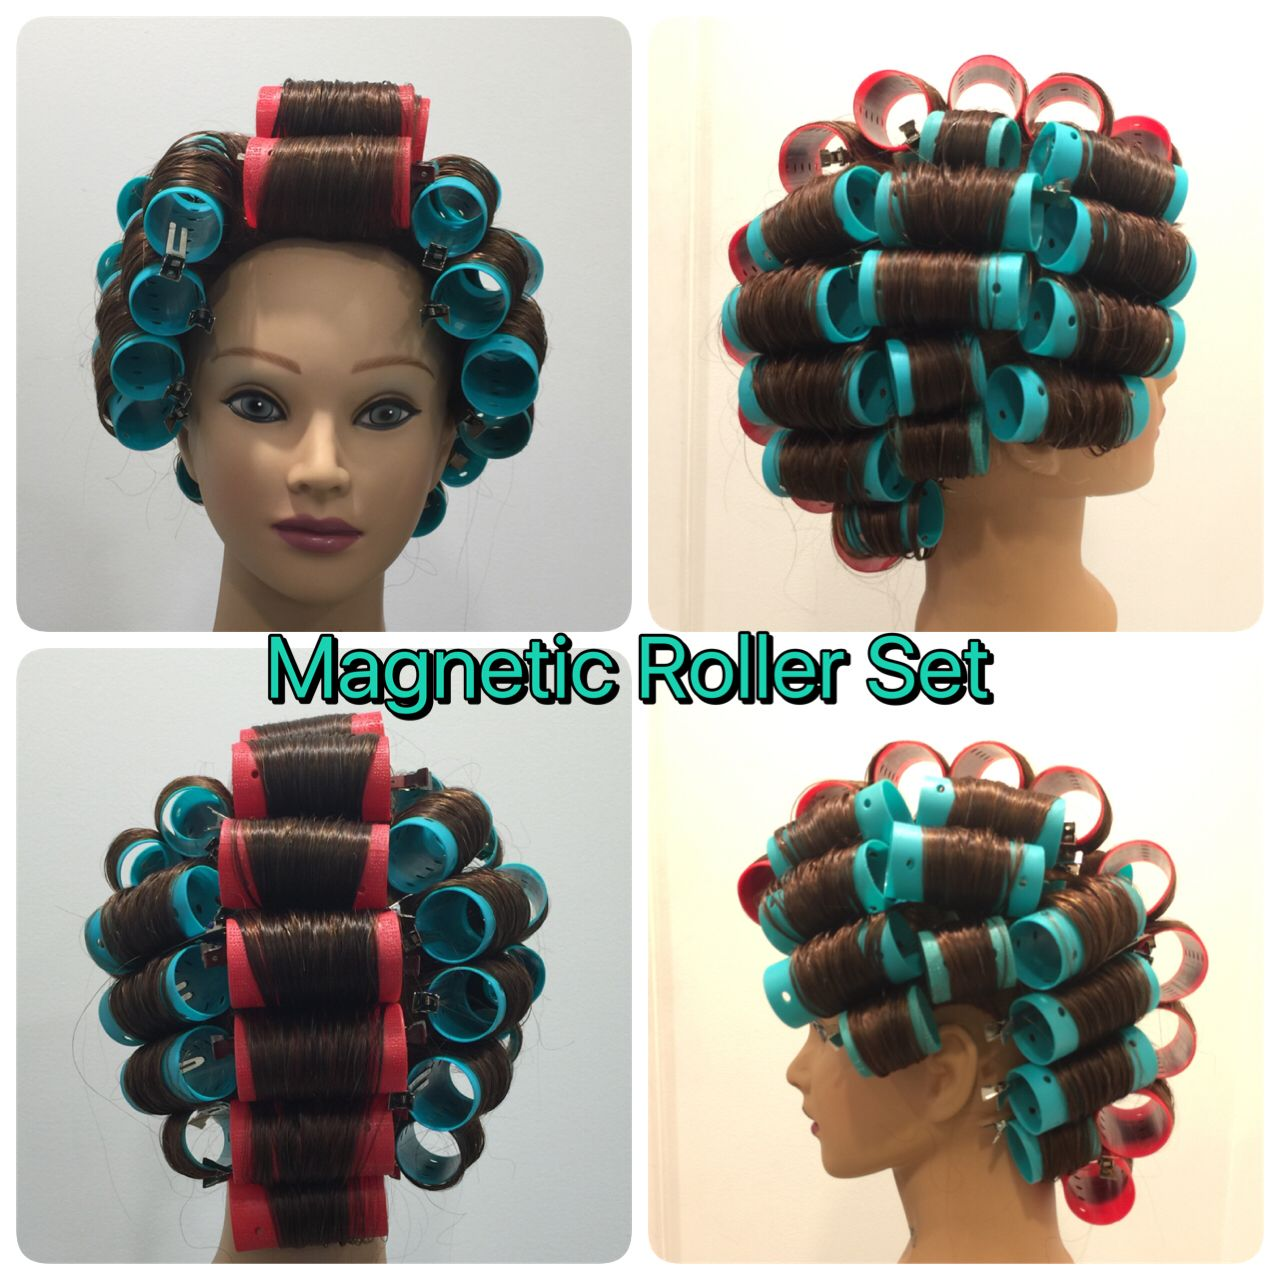 pin curl diagram 2004 jeep grand cherokee door wiring magnetic roller set  hairbelieveable rolle